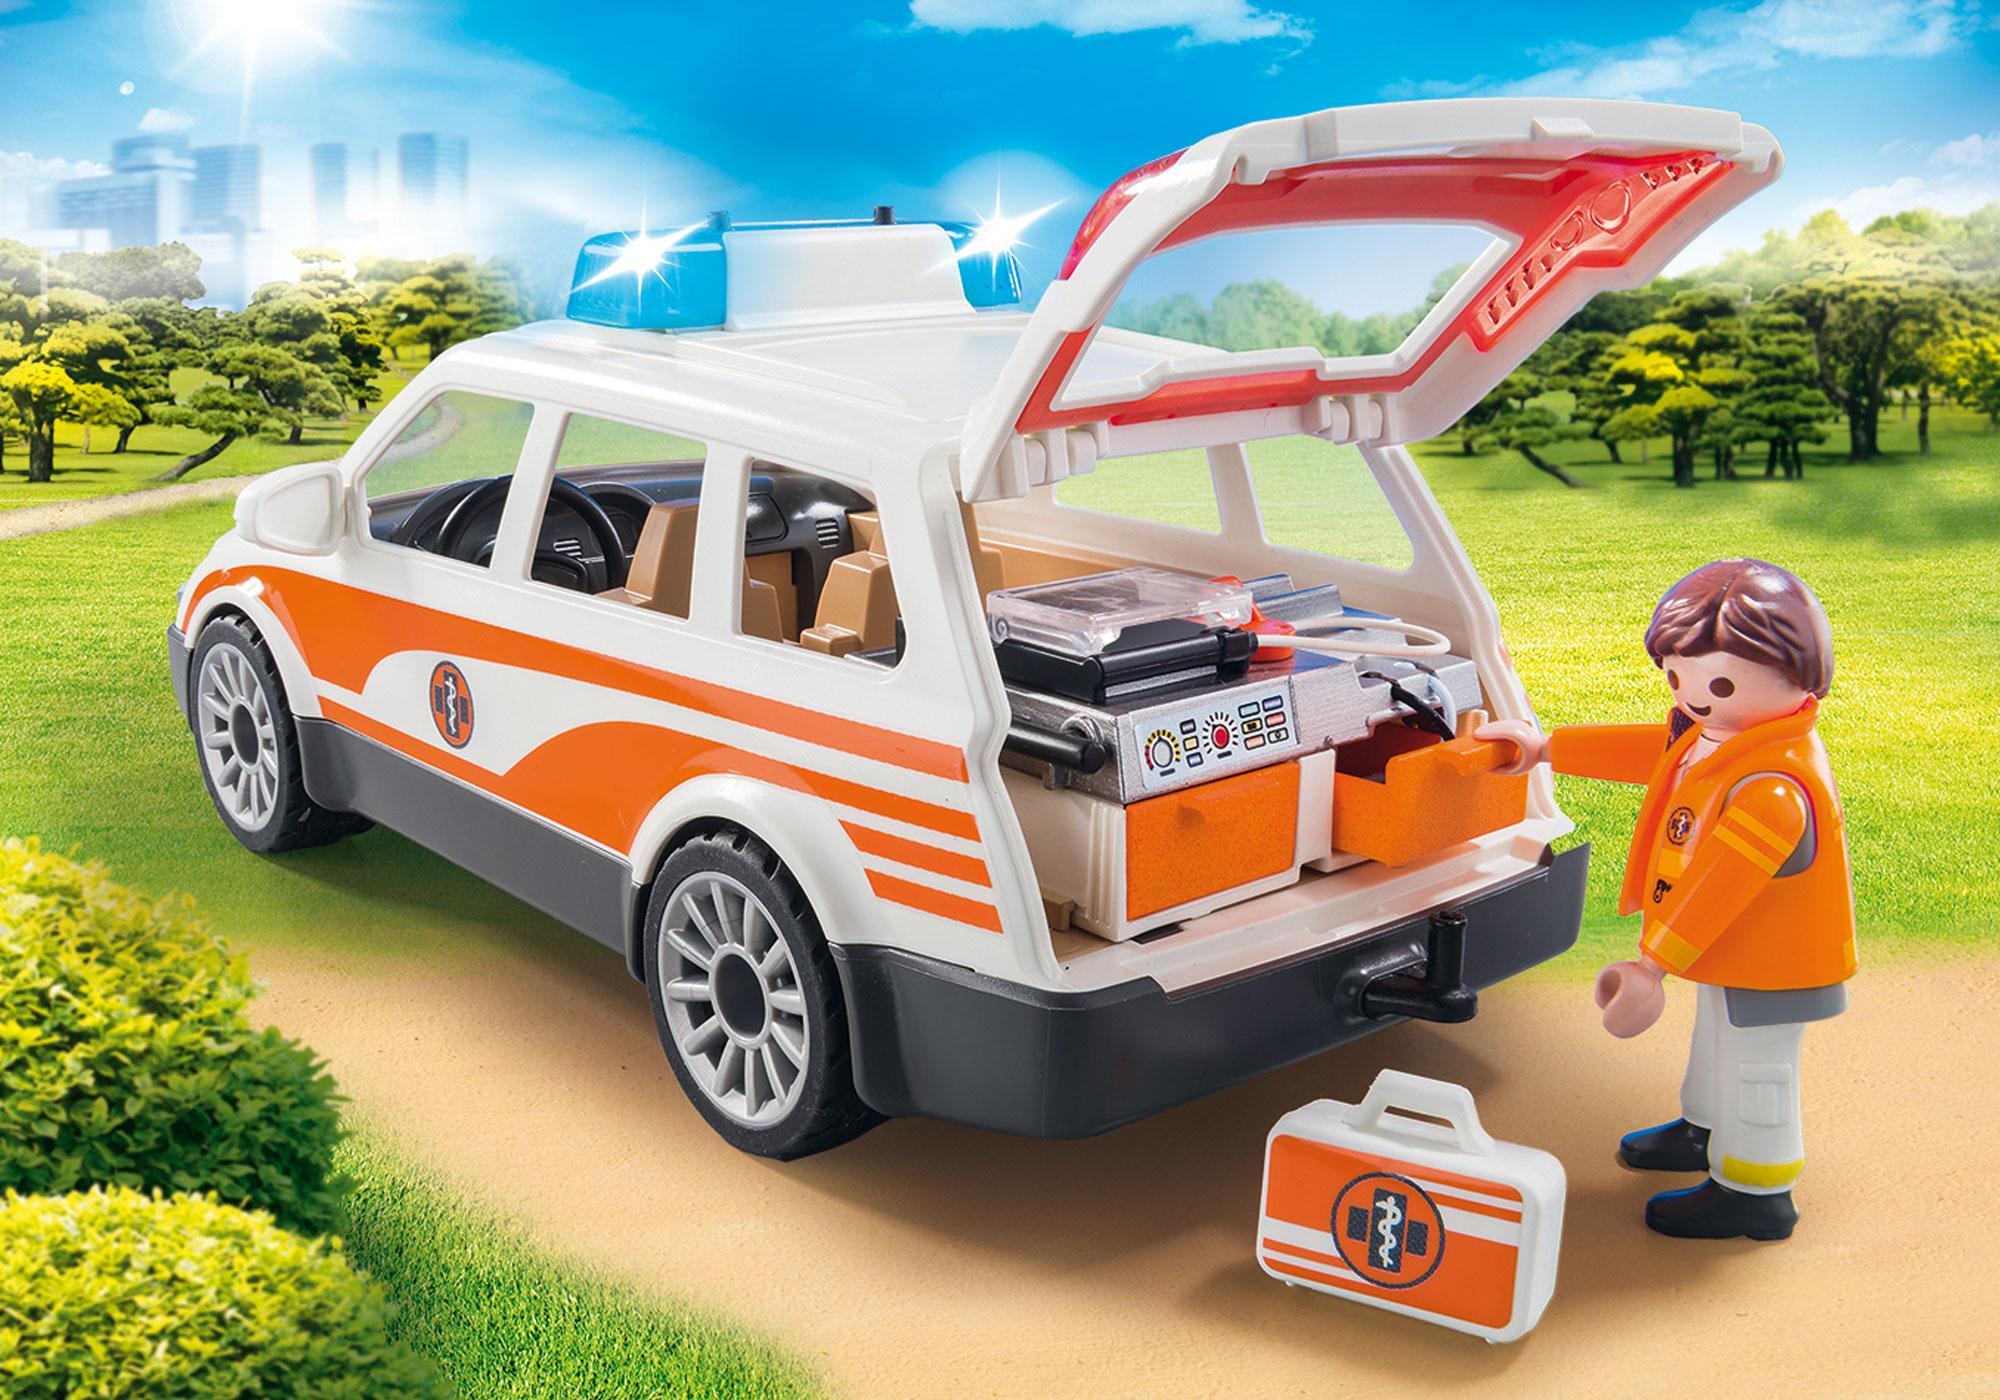 http://media.playmobil.com/i/playmobil/70050_product_extra1/Redningsbil med sirene